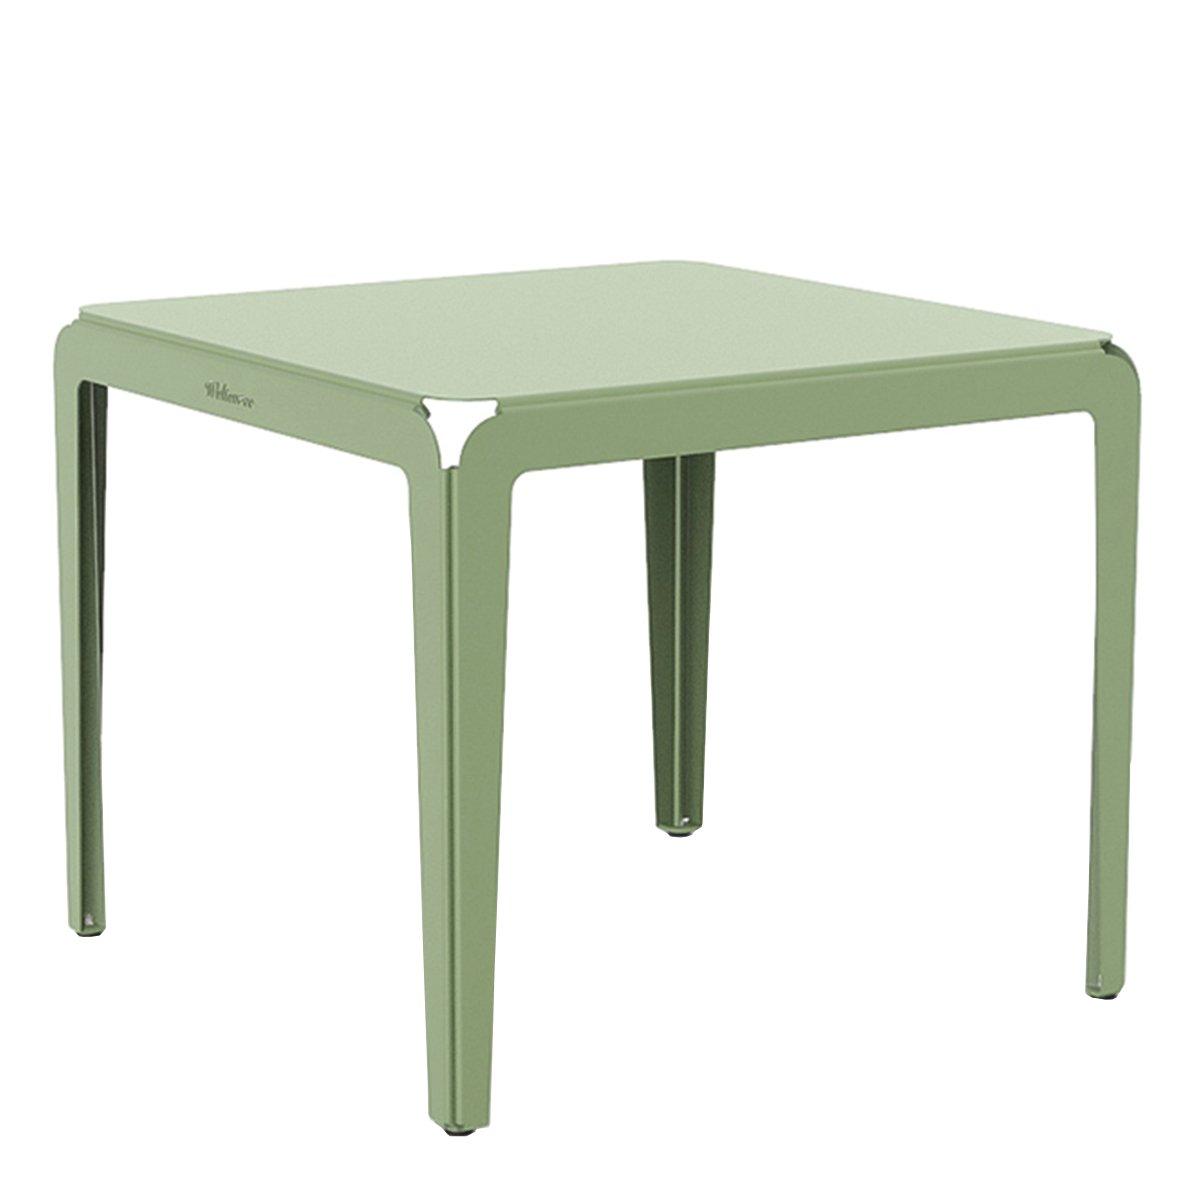 Weltevree Bended Tafel - Pale Green 90x90x75